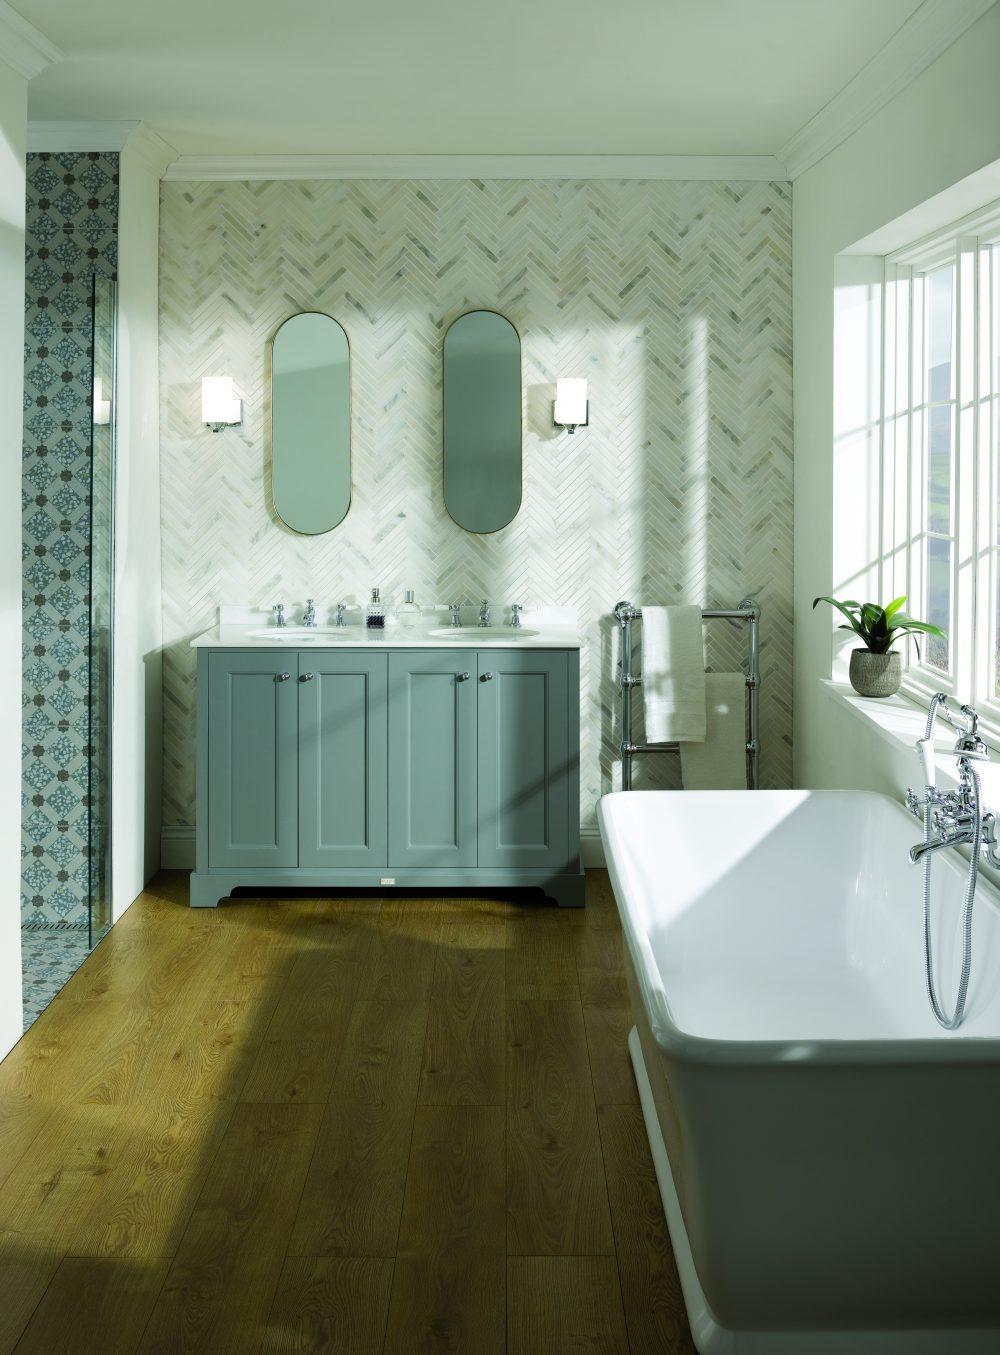 The Plummett Grey Double Basin Unit - with Ca' Pietra Tiles